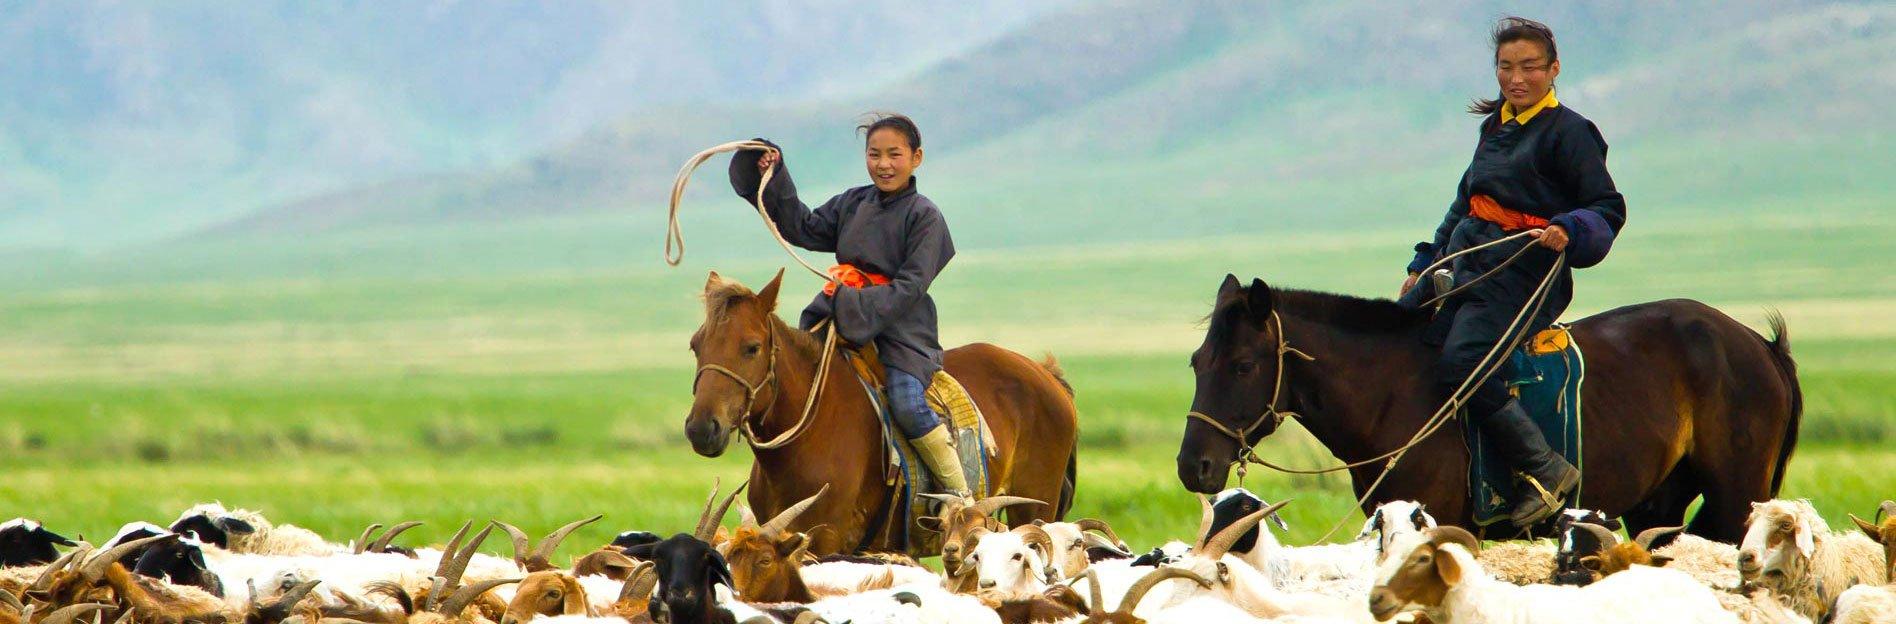 Mongolei Reisen Amicus Mongolei Reiseveranstalter